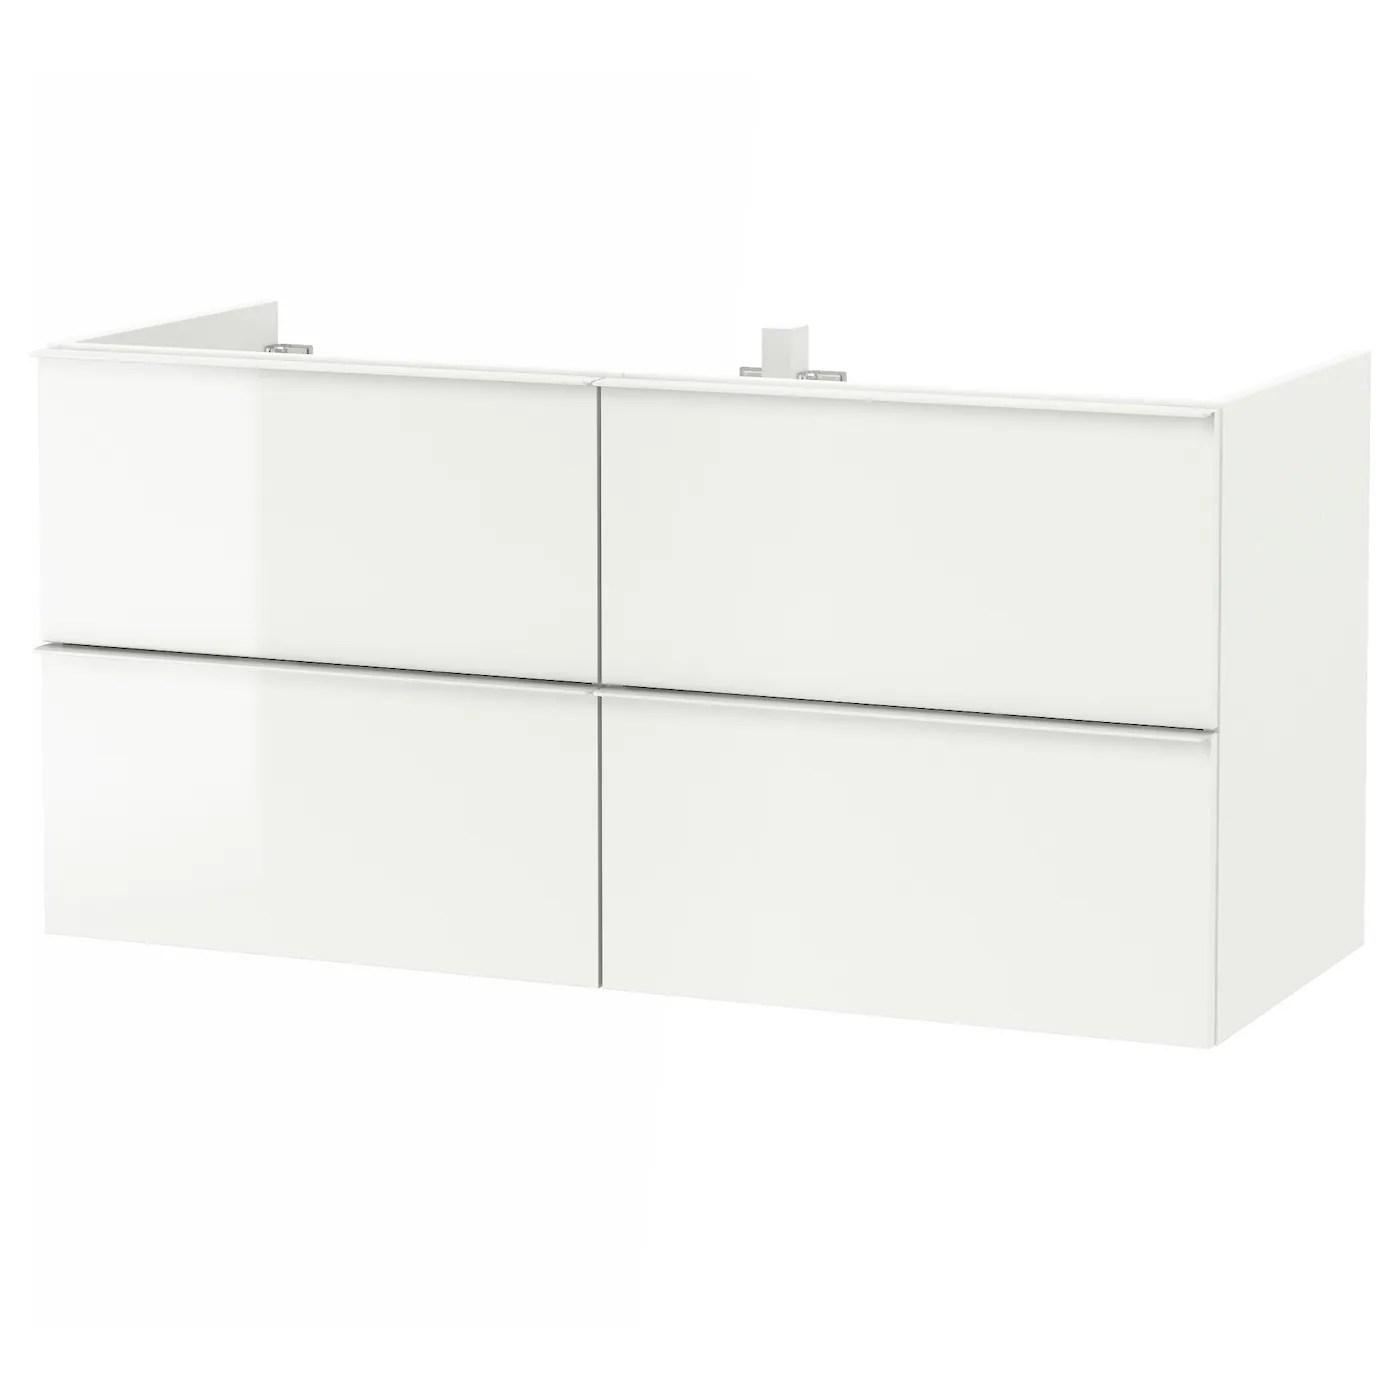 Godmorgon Meuble Lavabo 4tir Brillant Blanc 120x47x58 Cm Ikea